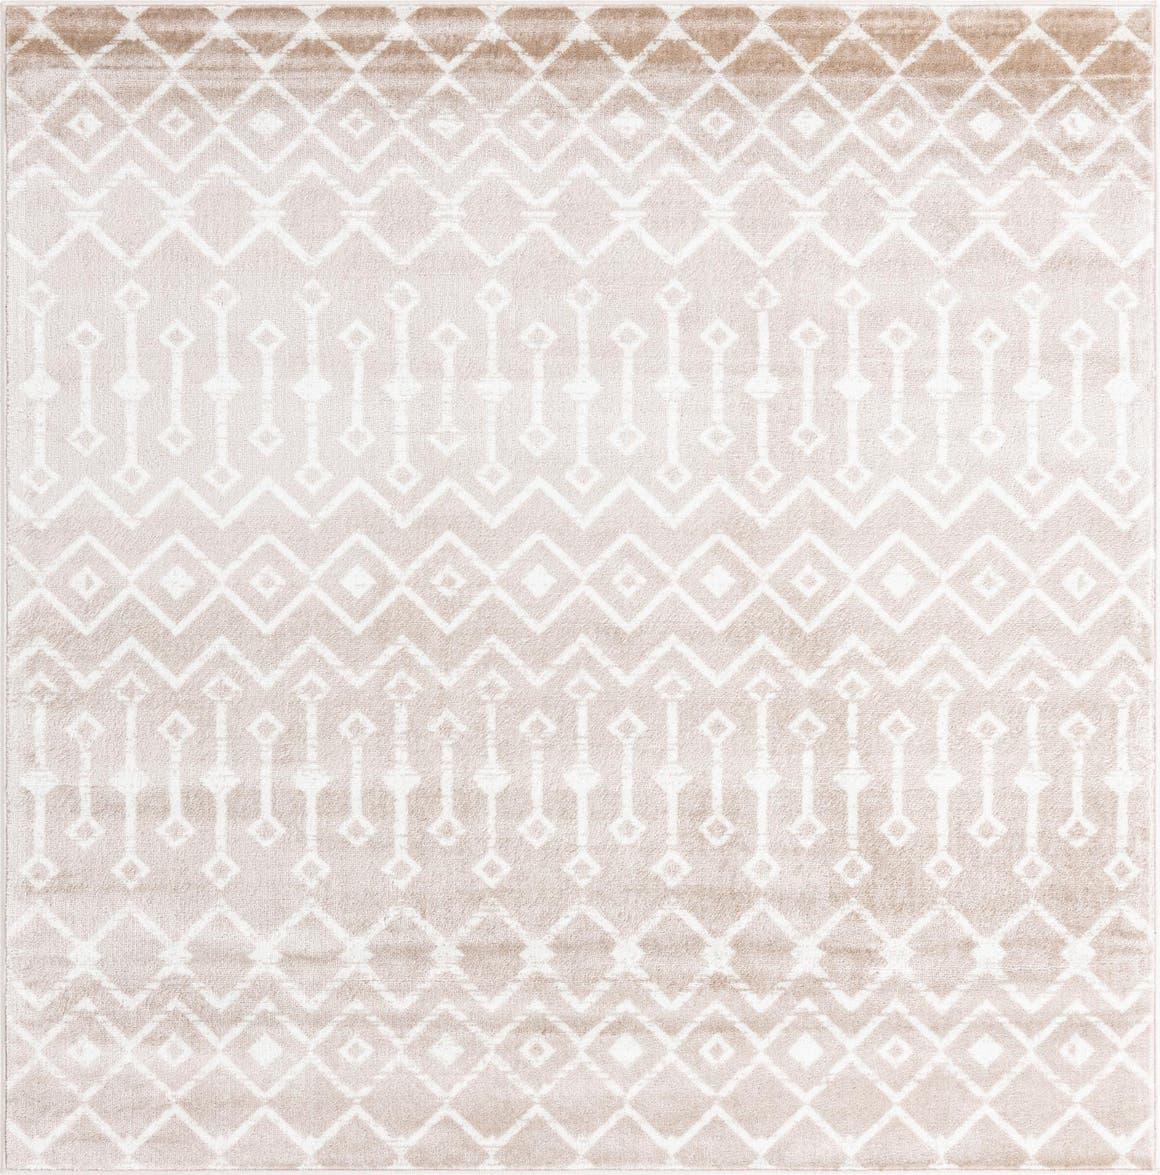 6' x 6' Kasbah Trellis Square Rug main image